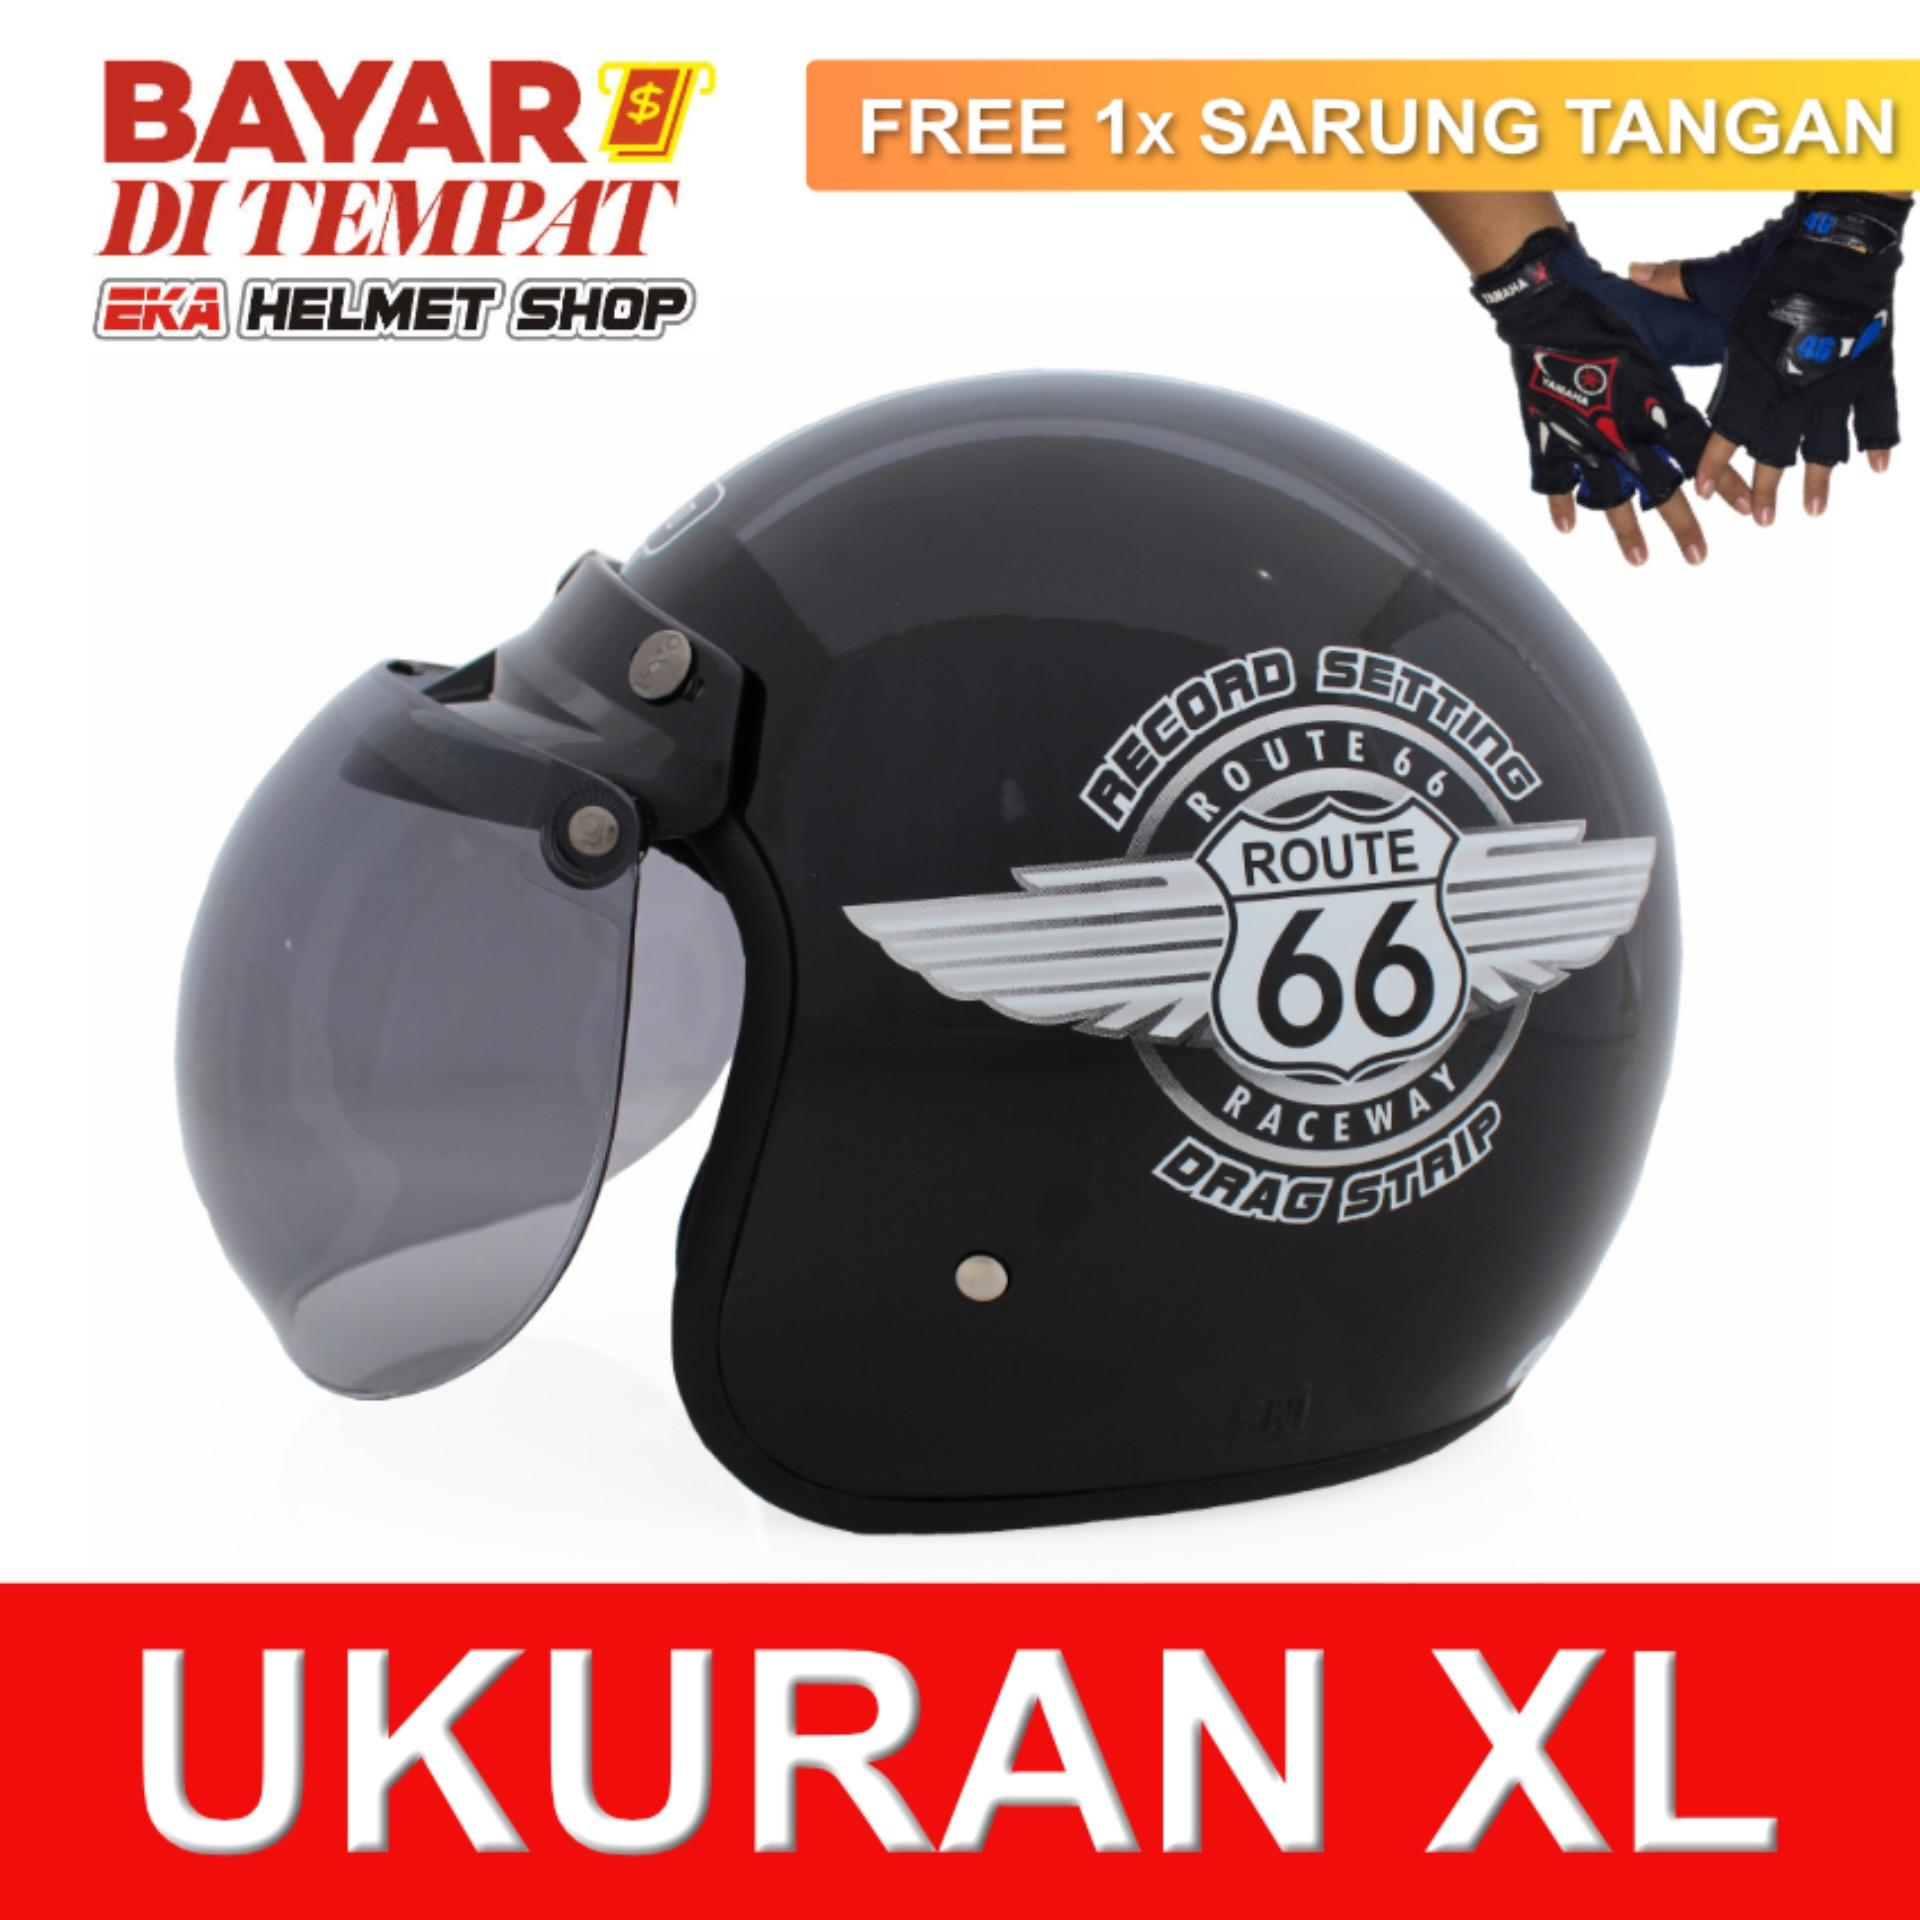 Review Wto Helmet Retro Bogo 66 Hitam Promo Gratis Sarung Tangan Wto Helmet